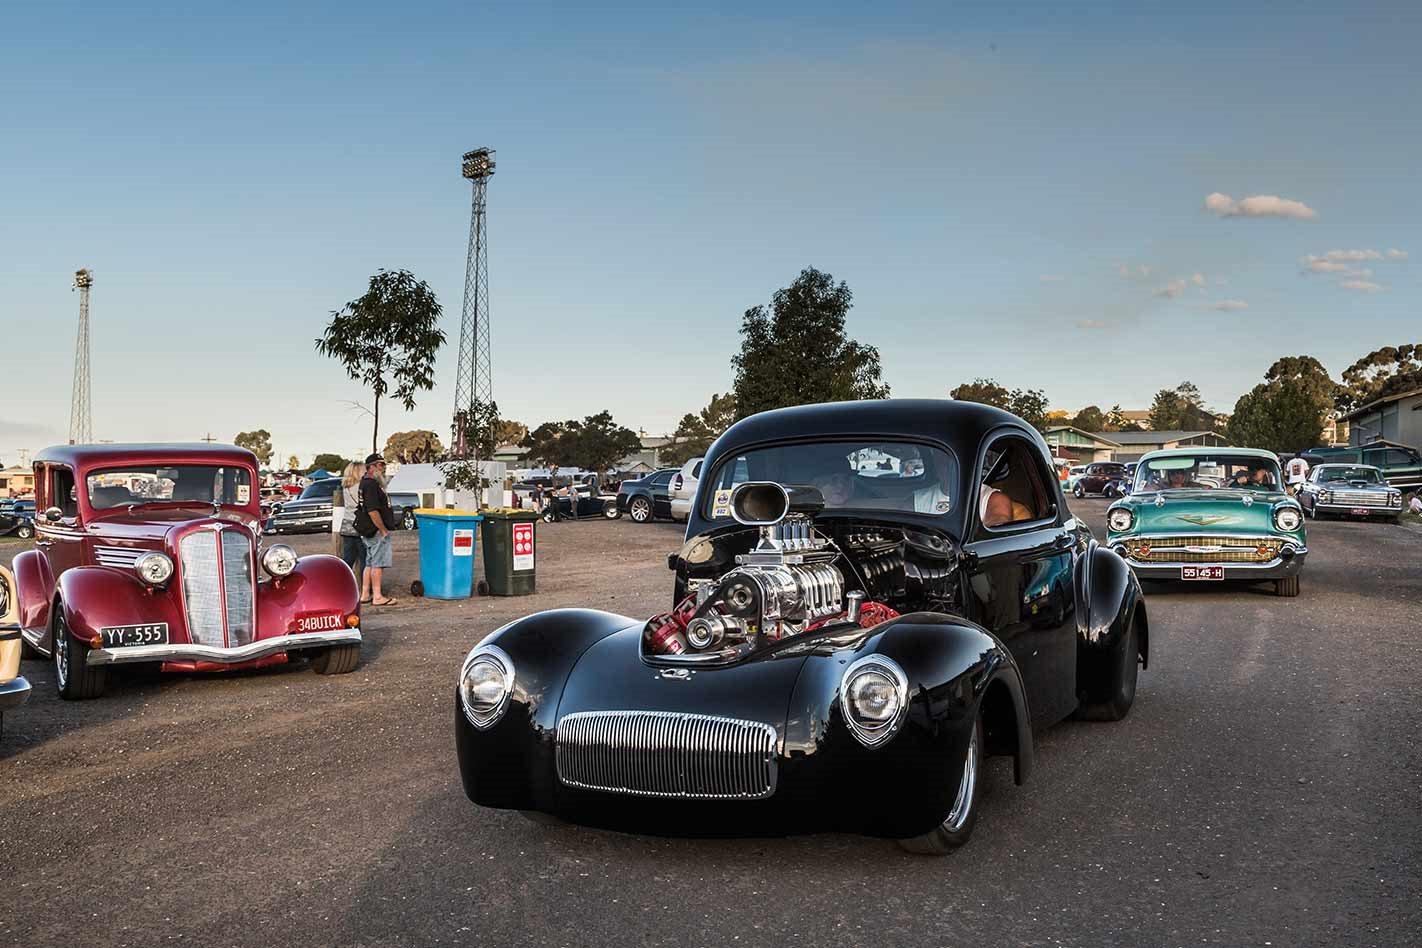 Great Street Rod Vs Hot Rod Images - Classic Cars Ideas - boiq.info